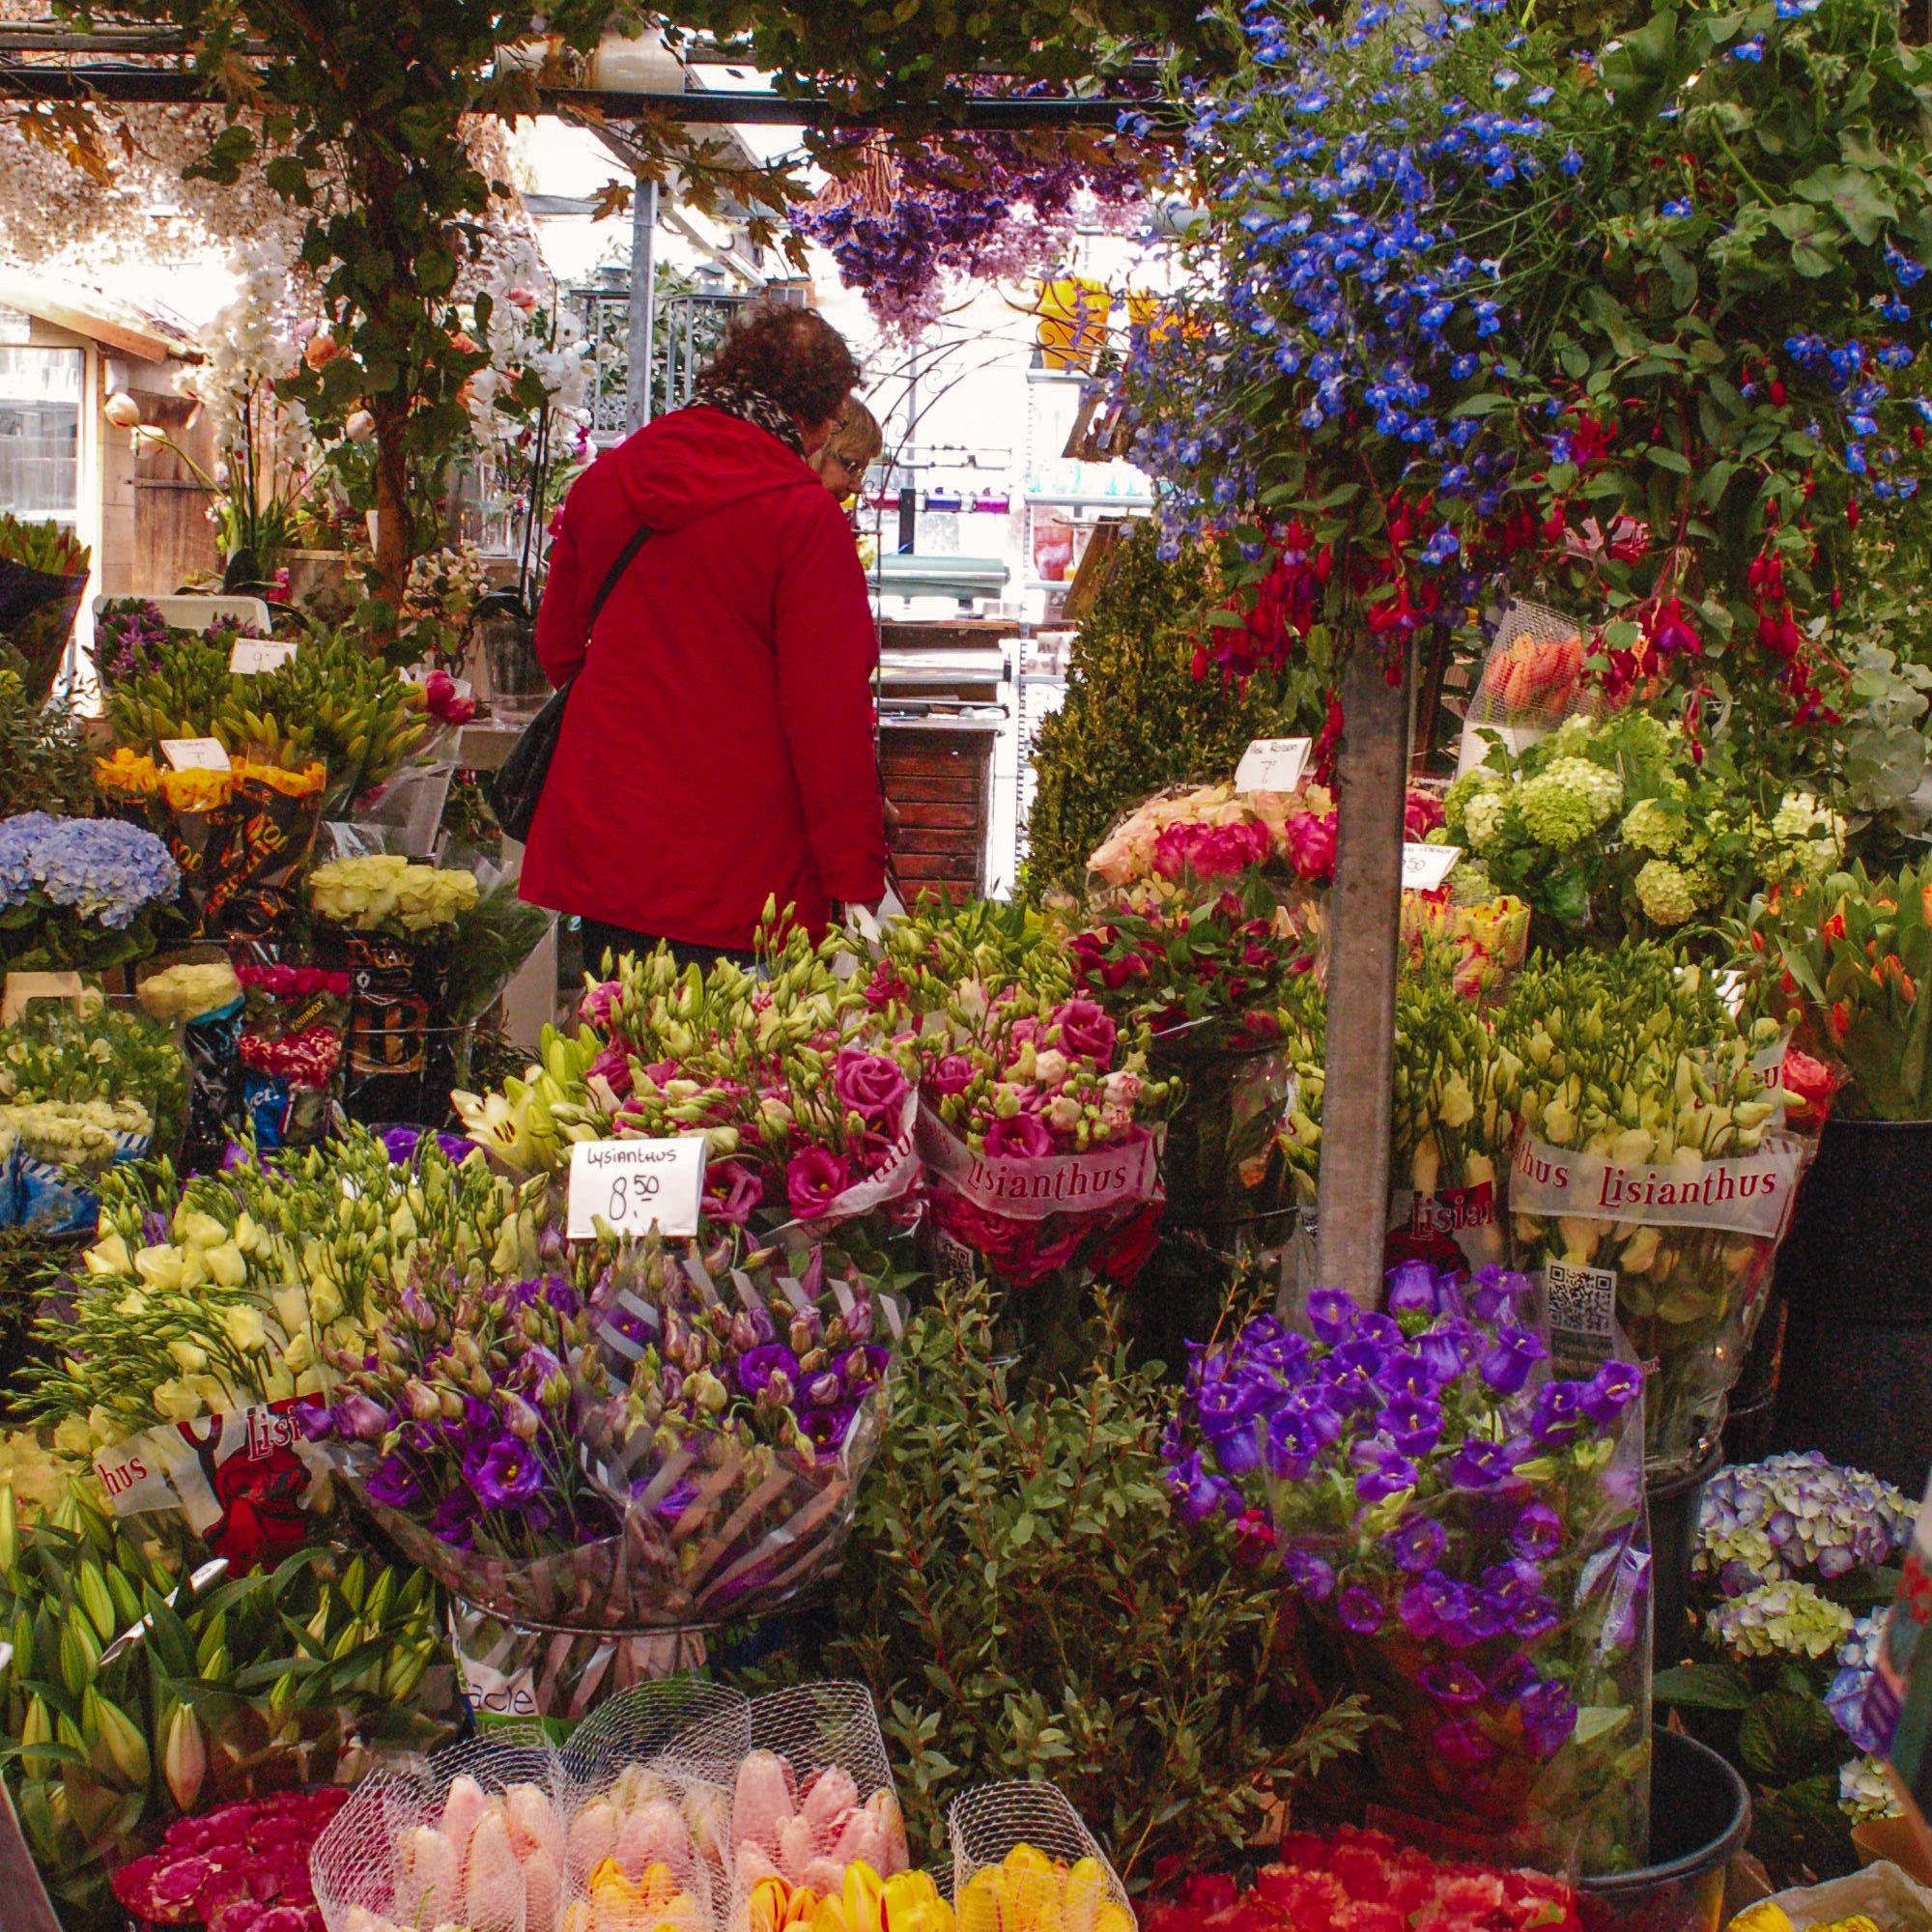 The flower market in Amsterdam